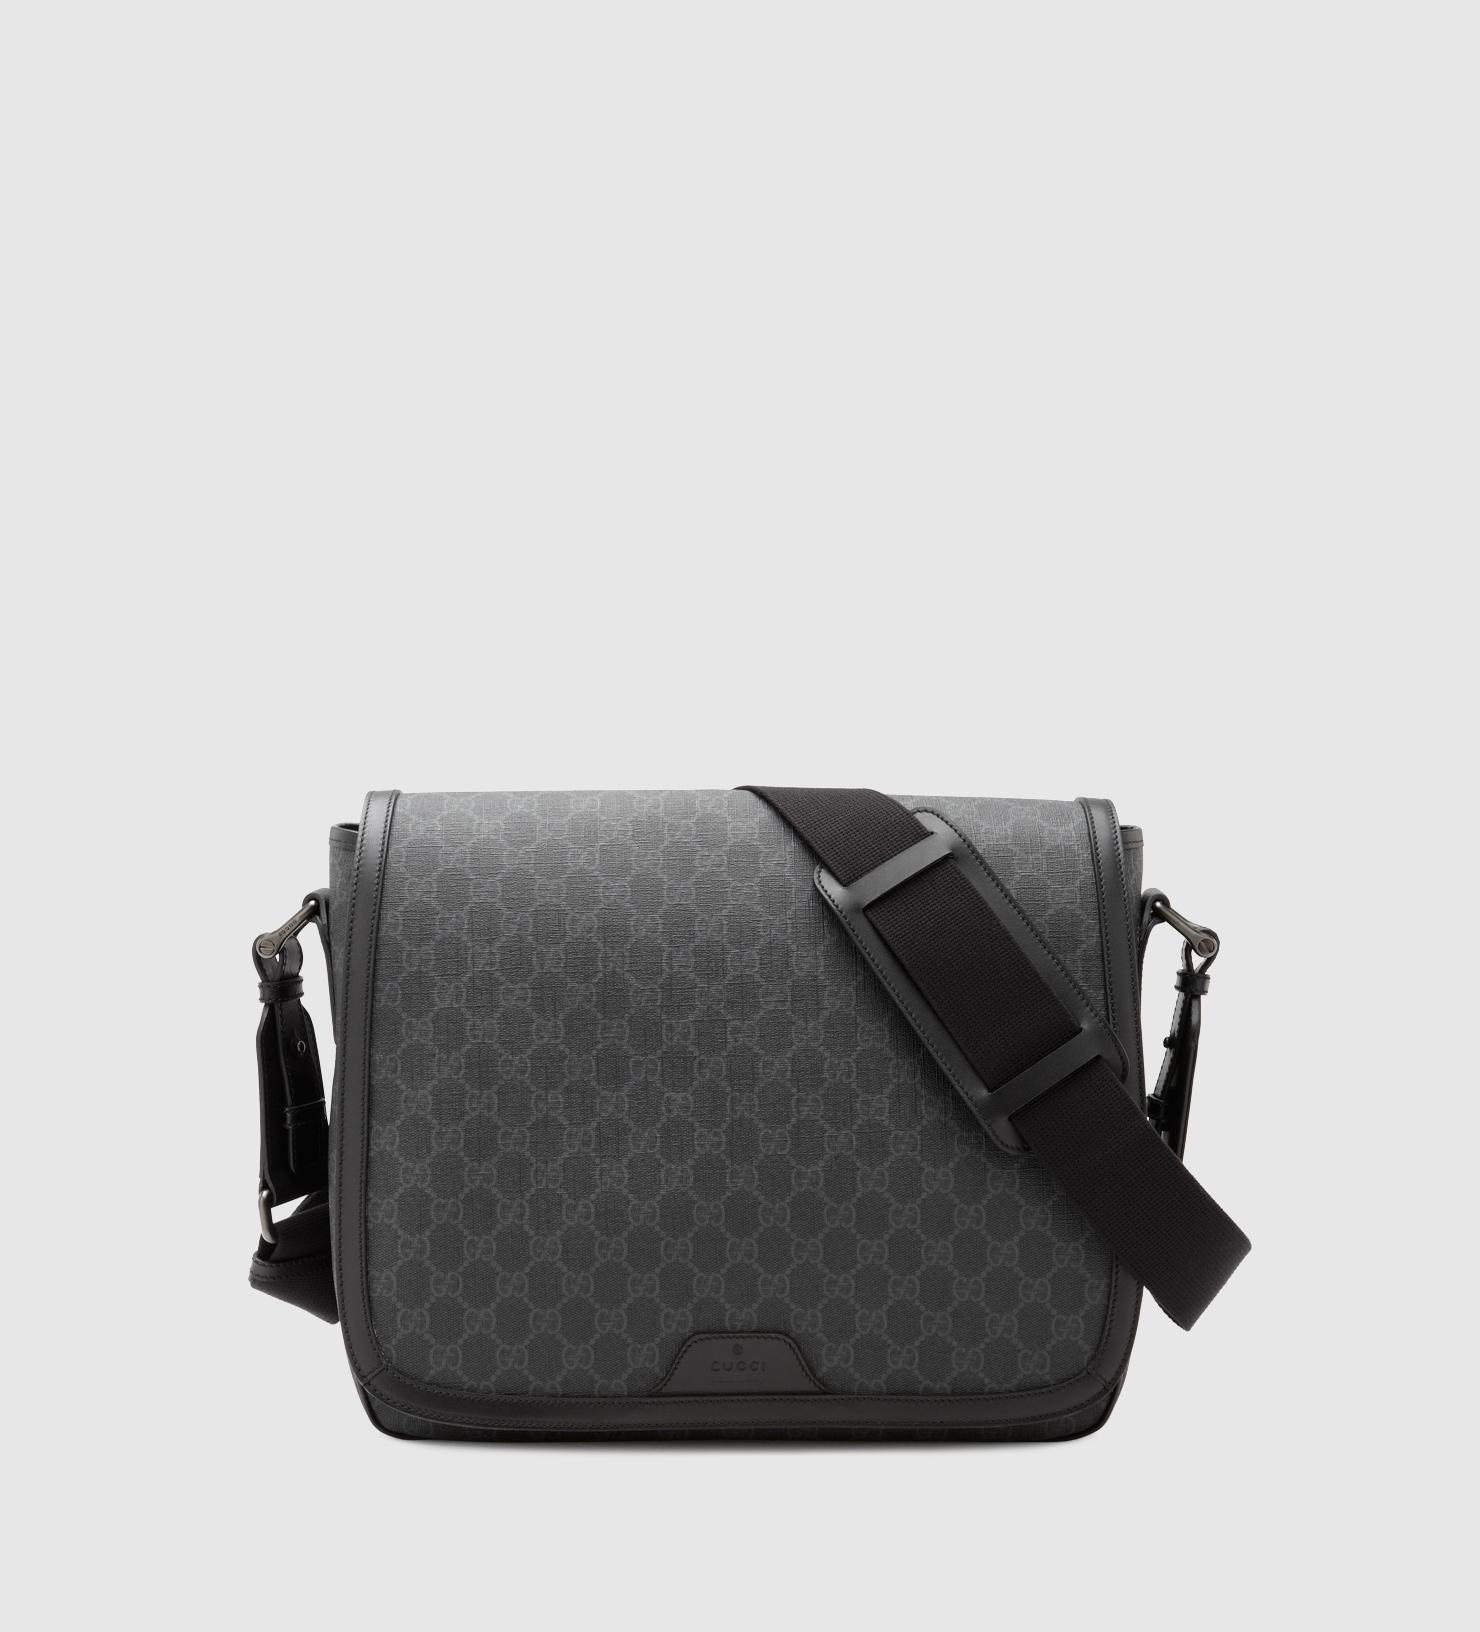 645a823f9f8a1 Gucci Gg Supreme Canvas Messenger Bag in Gray for Men - Lyst